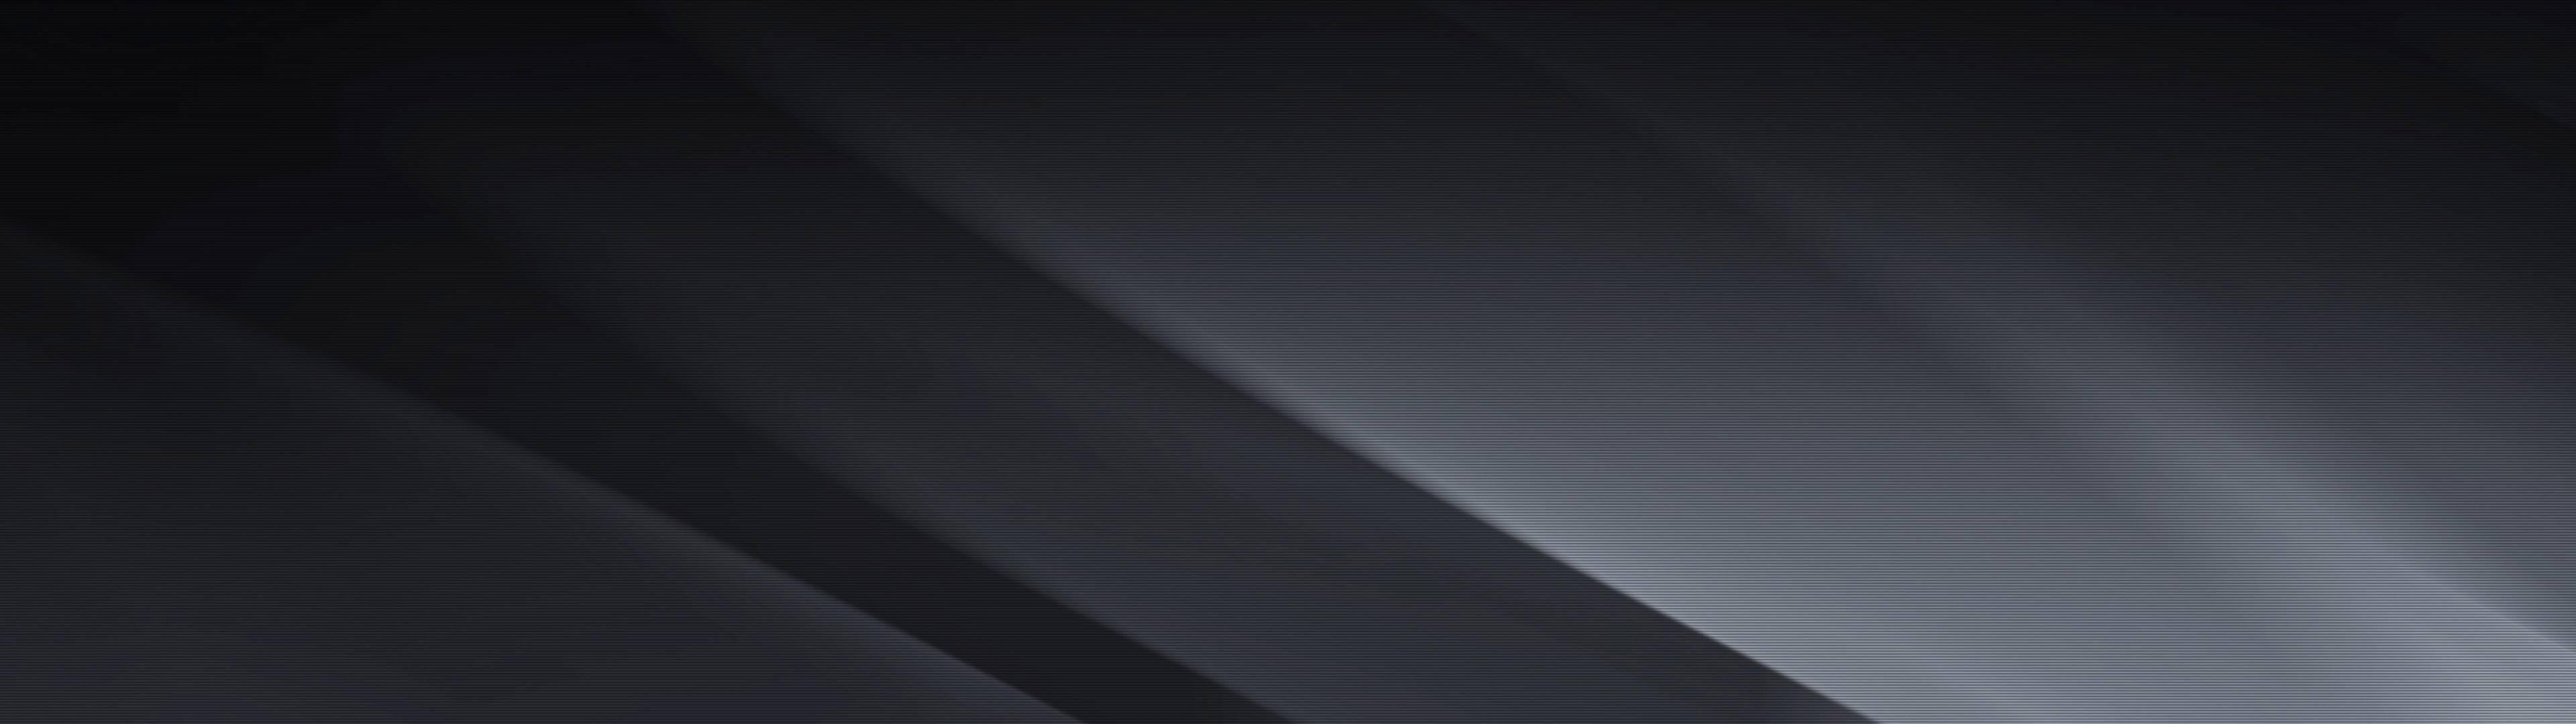 Free Download 3840x1080 Dual Screen Wallpaper 3840x1080 Iron Man